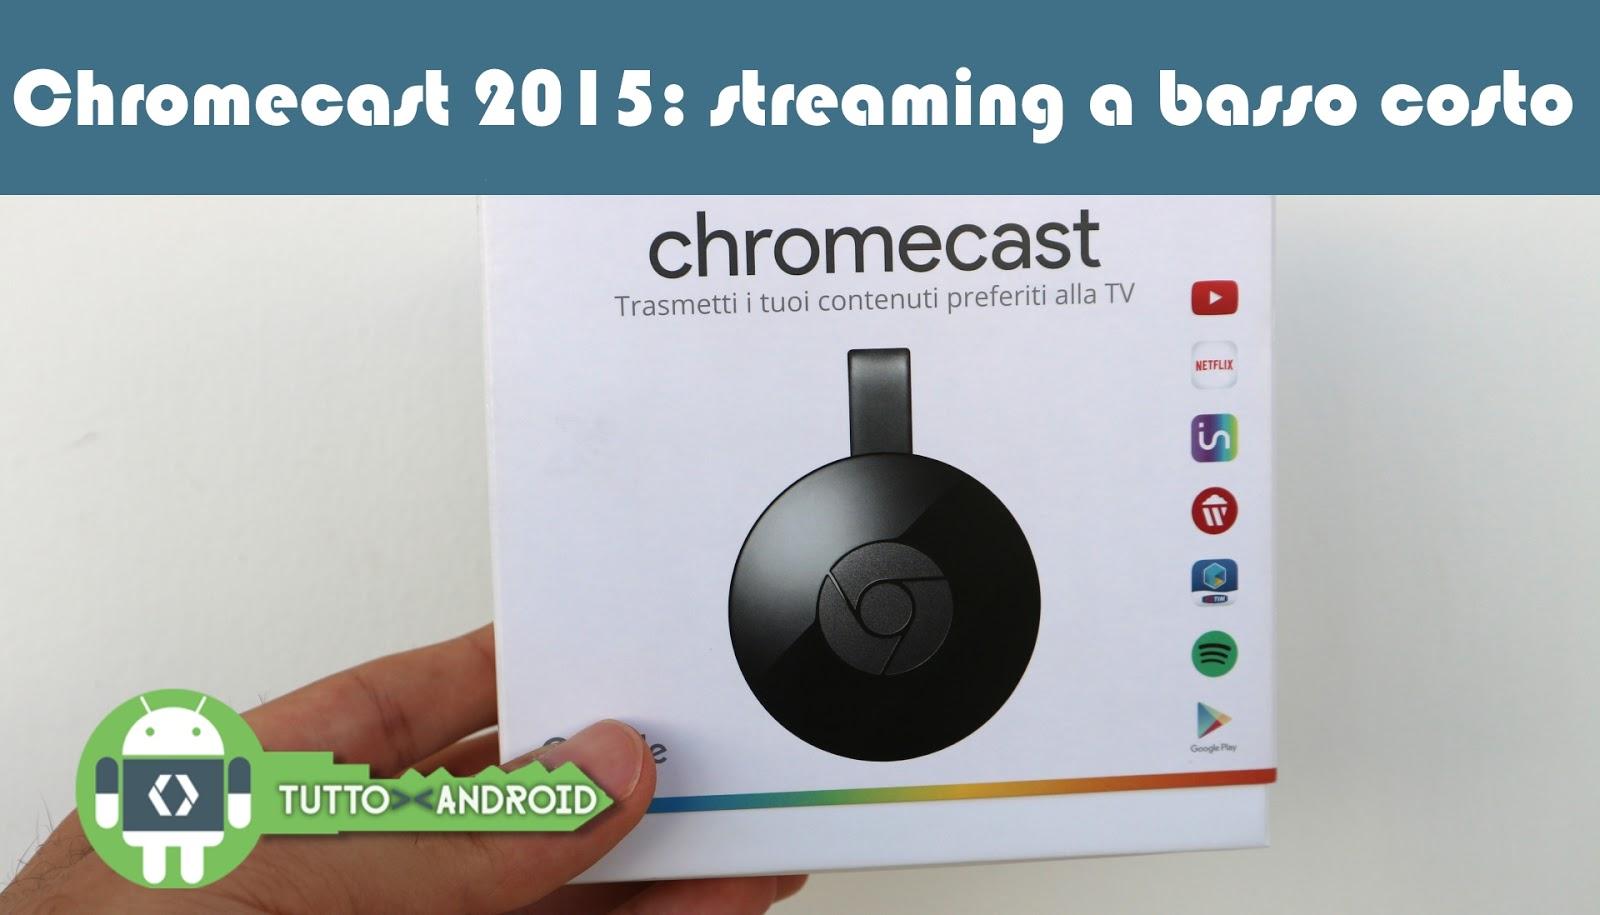 Chromecast costo